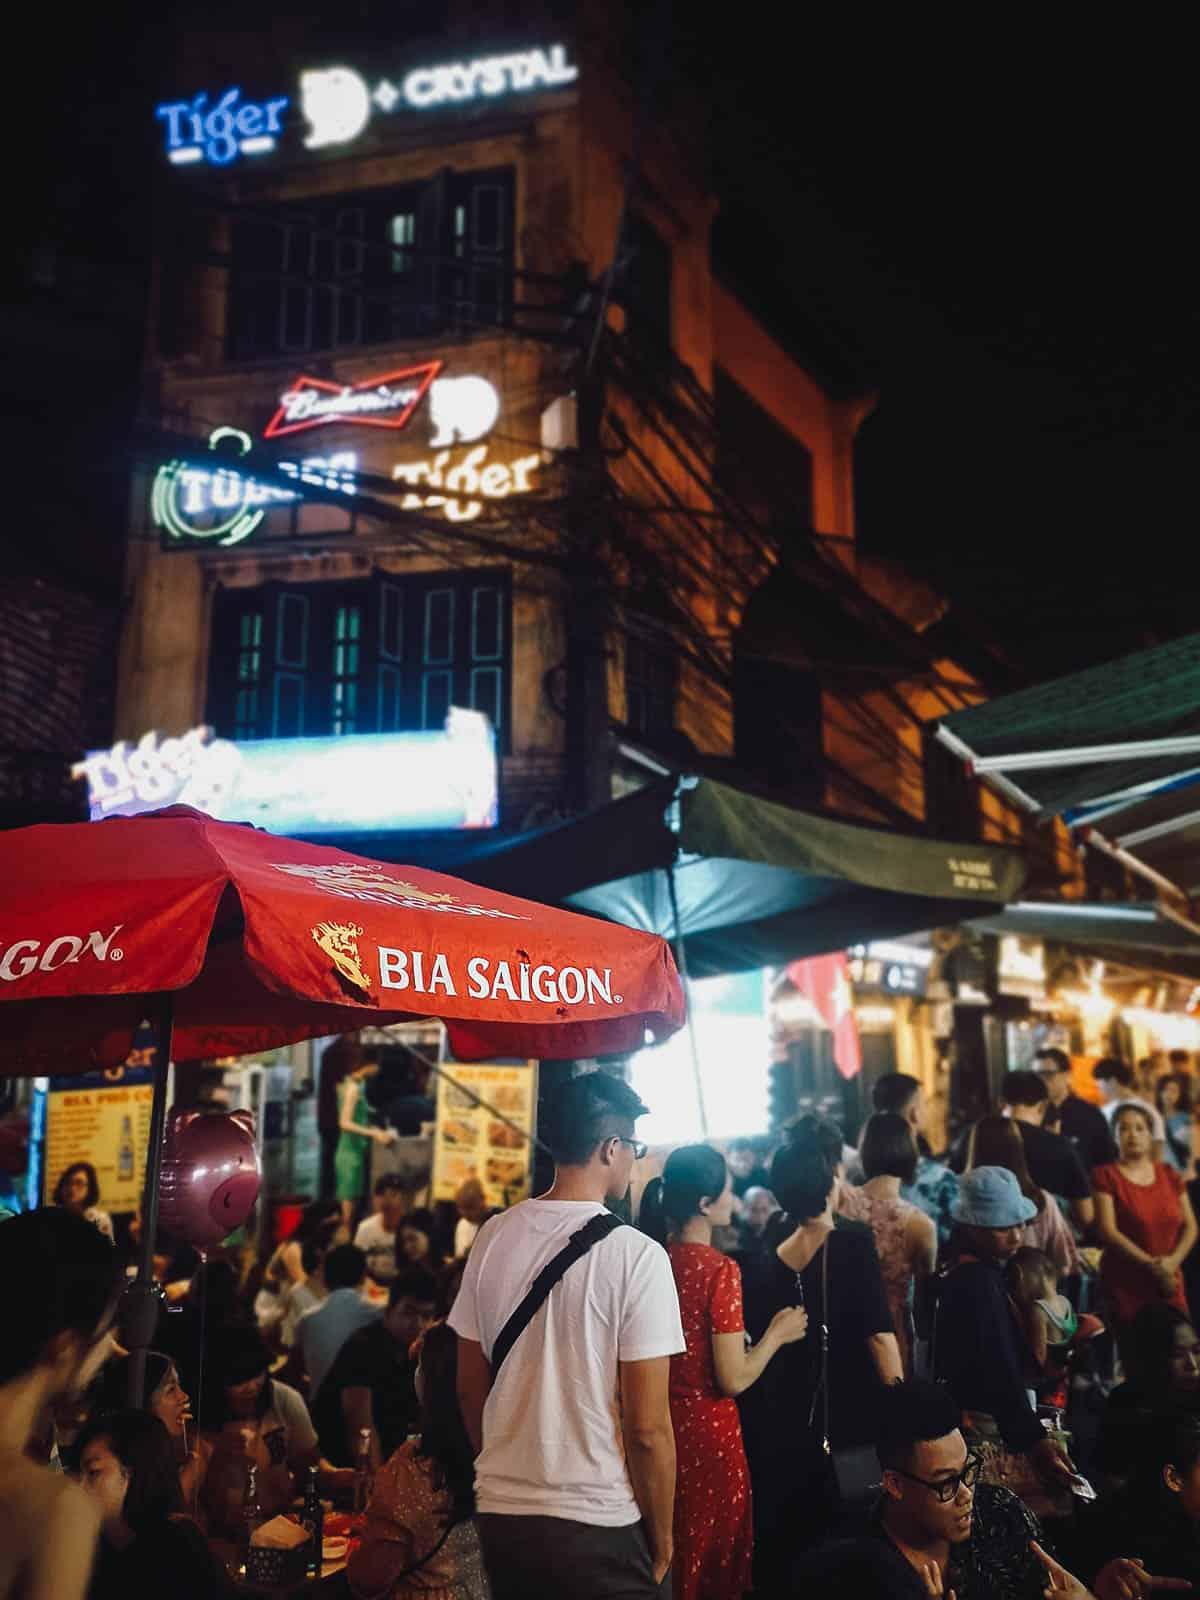 Bia hoi corner in Hanoi, Vietnam